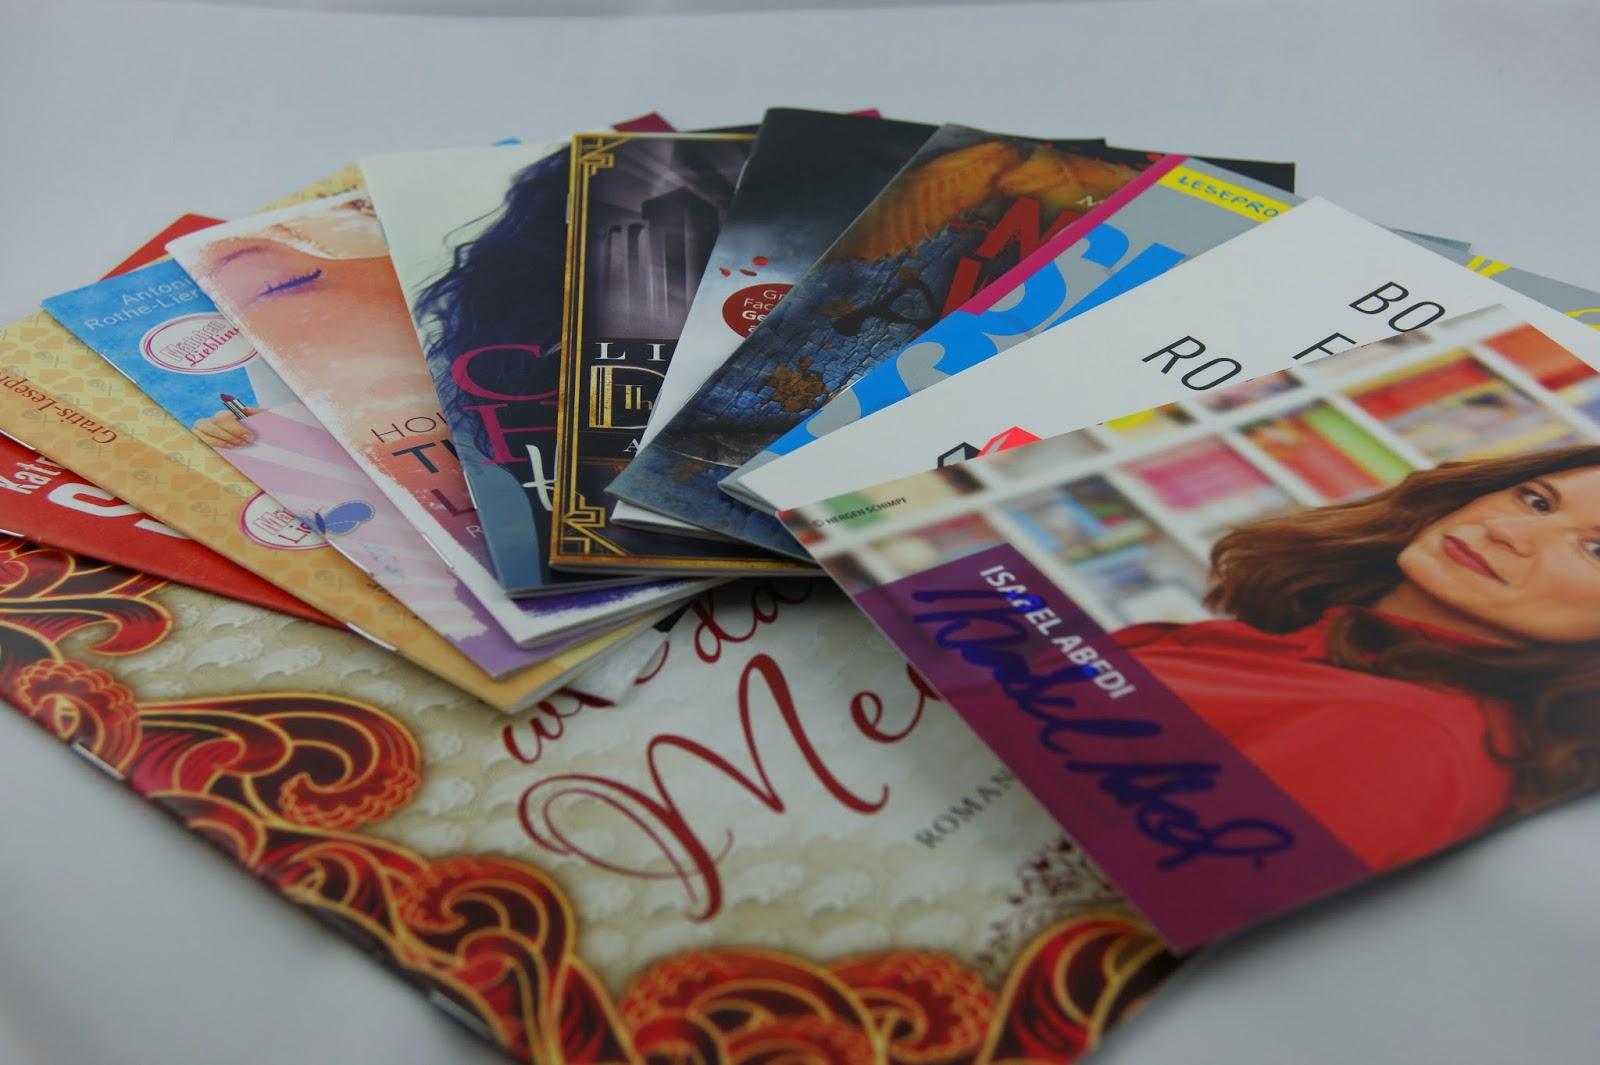 Leser-Überlebenspaket_Leseproben_Autogrammkarte_Postkarte_Fotozelt